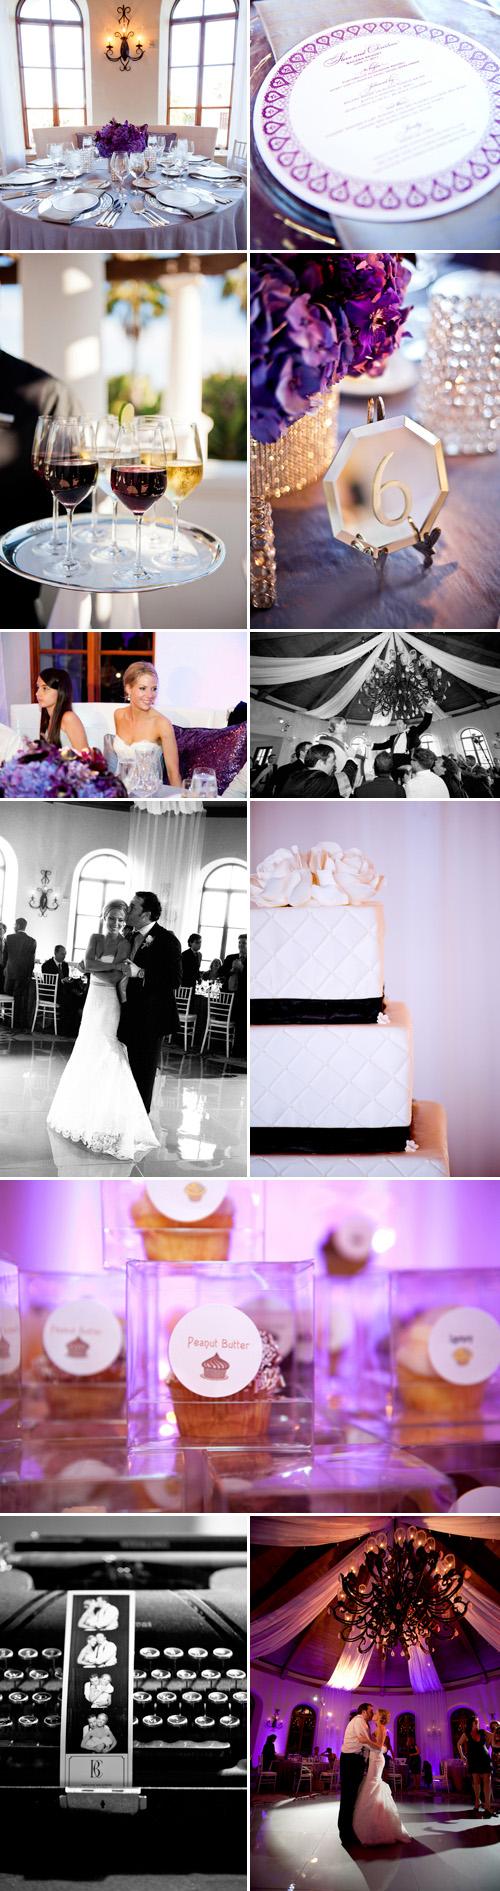 lilac and gray wedding colors, Old Hollywood glamour, Santa Barbara, California wedding at the Bacara Resort by Yvette Roman Photography and La Fete Weddings